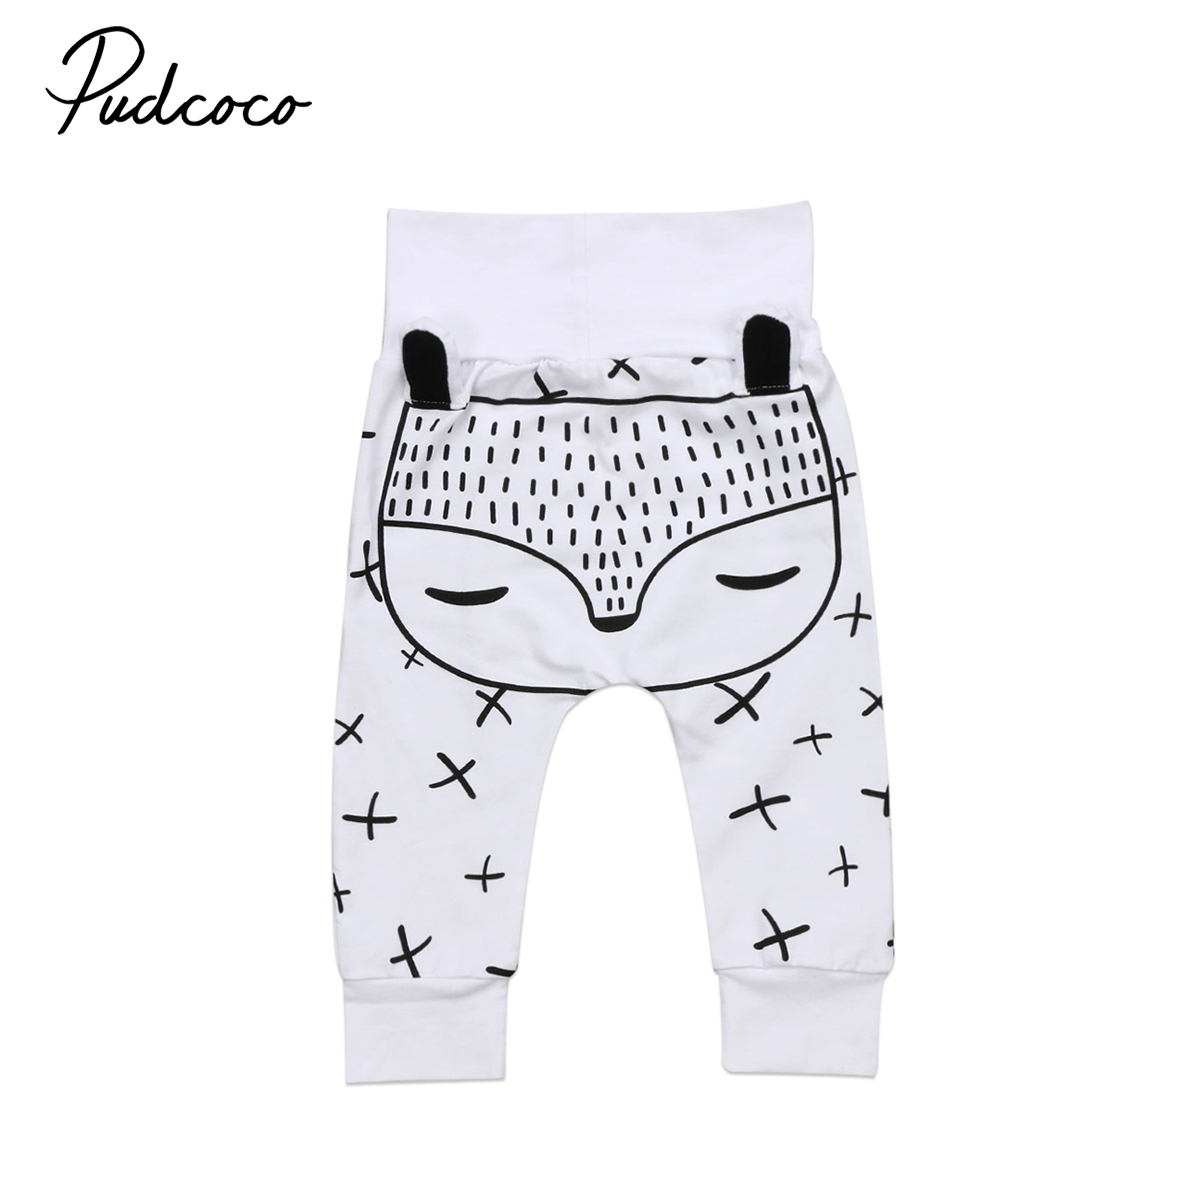 Pudcoco Baby Pants Kids Newborn Baby Boys Girls Long Harem Pants Trousers Leggings Bottoms 0-24M